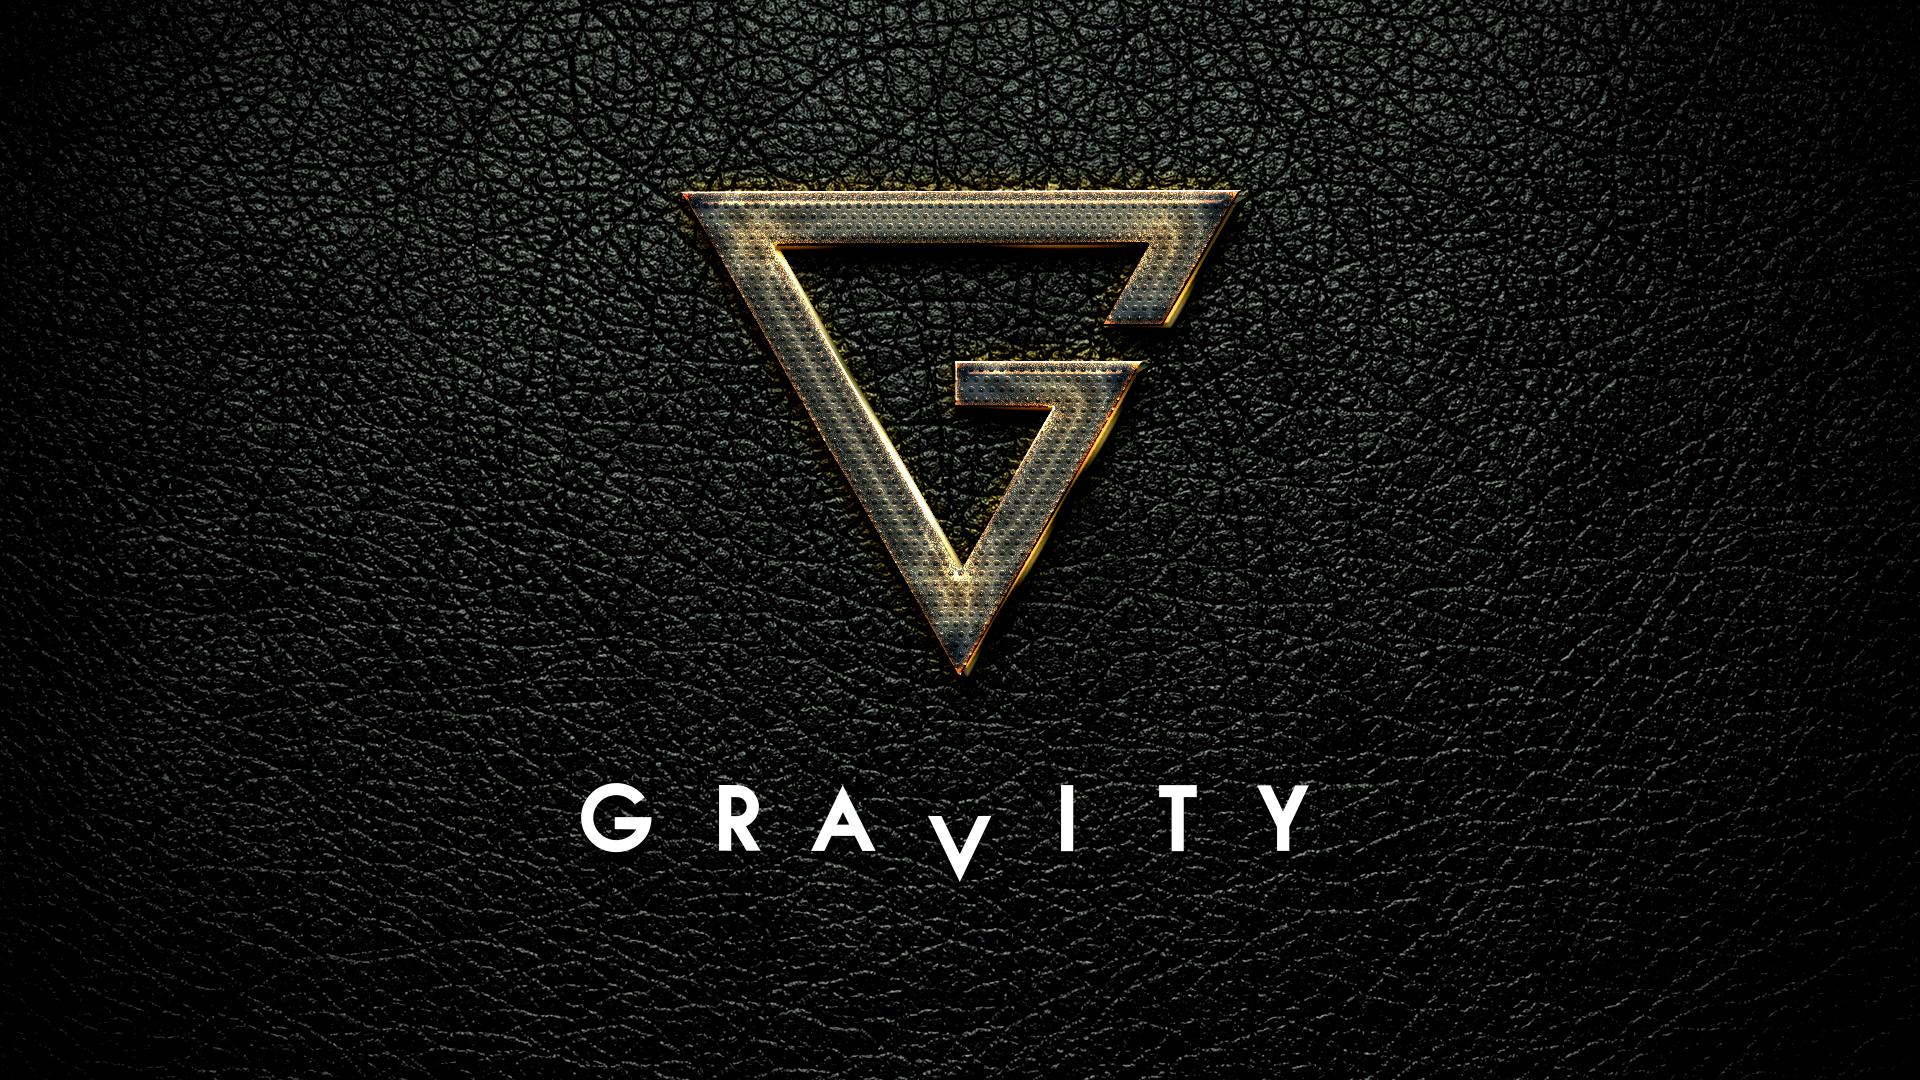 Gravity_metal.jpg